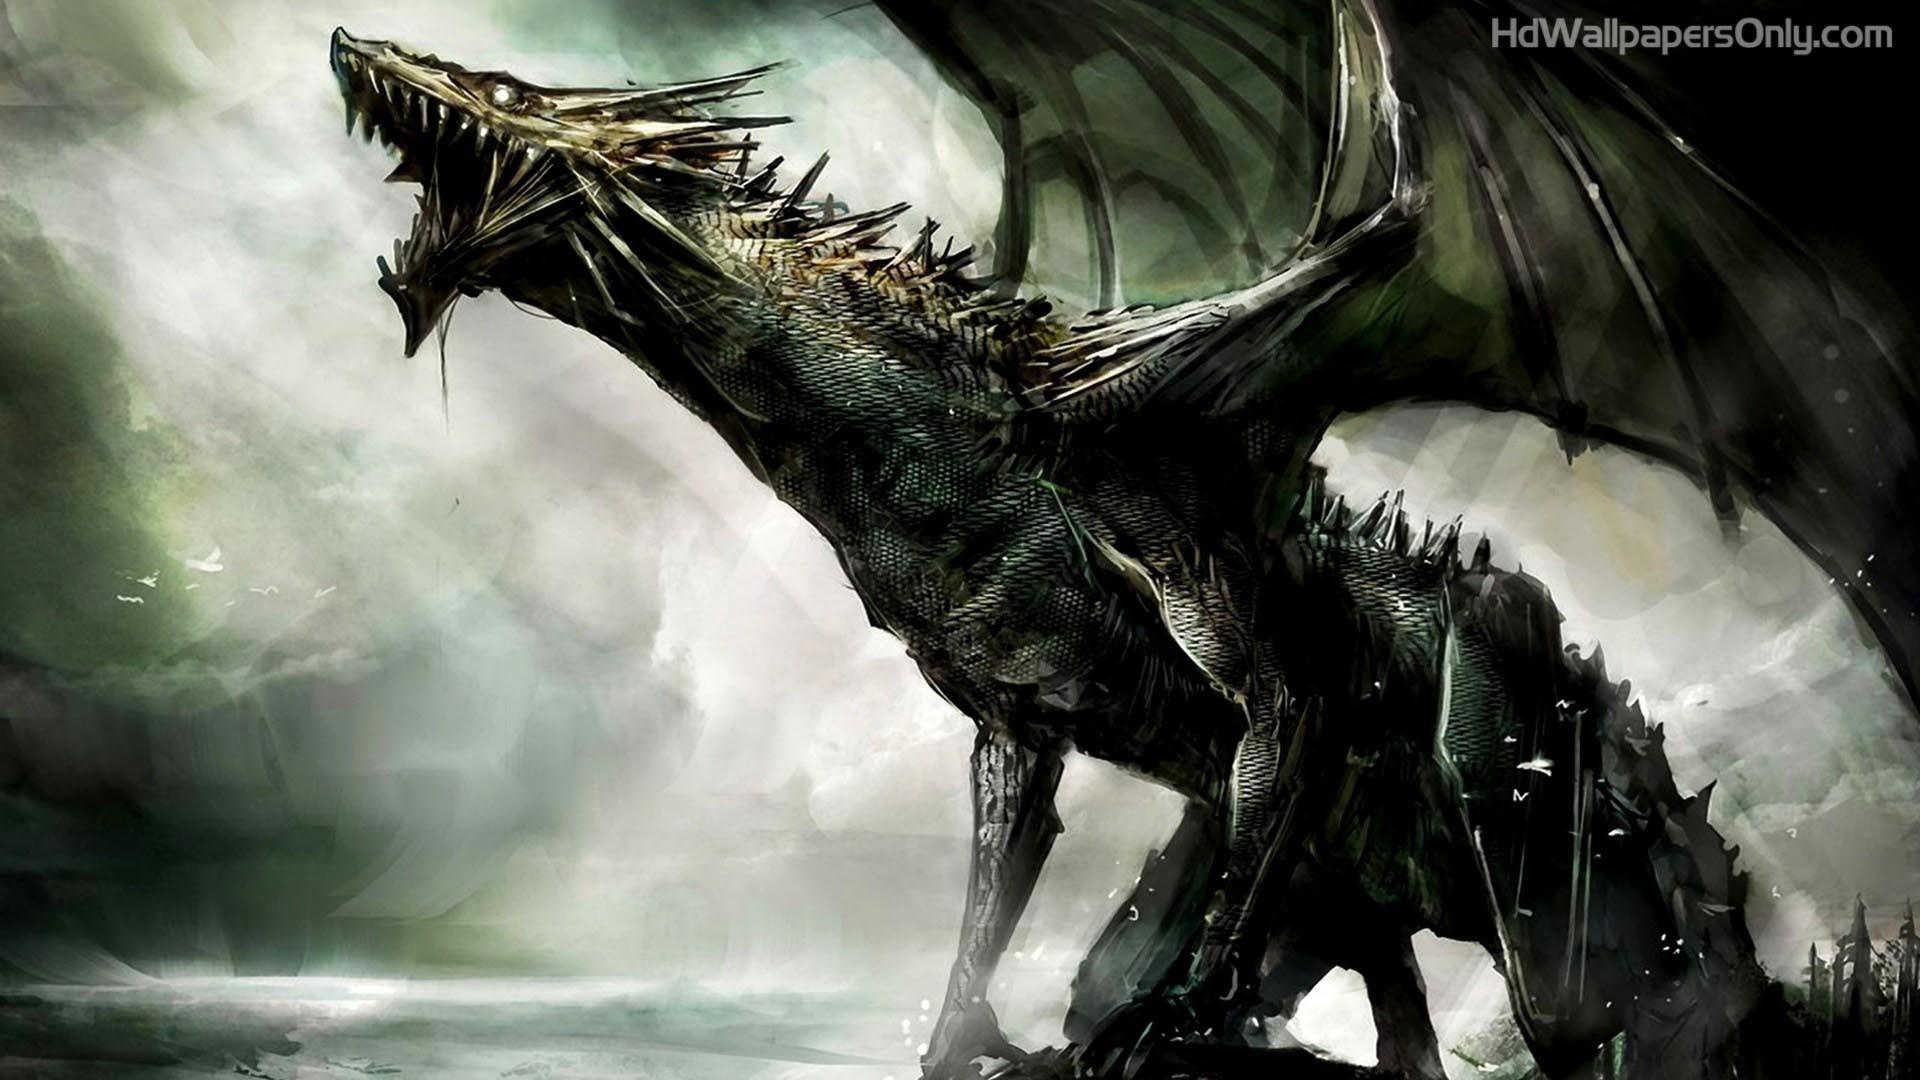 70+ black dragon wallpapers on wallpaperplay